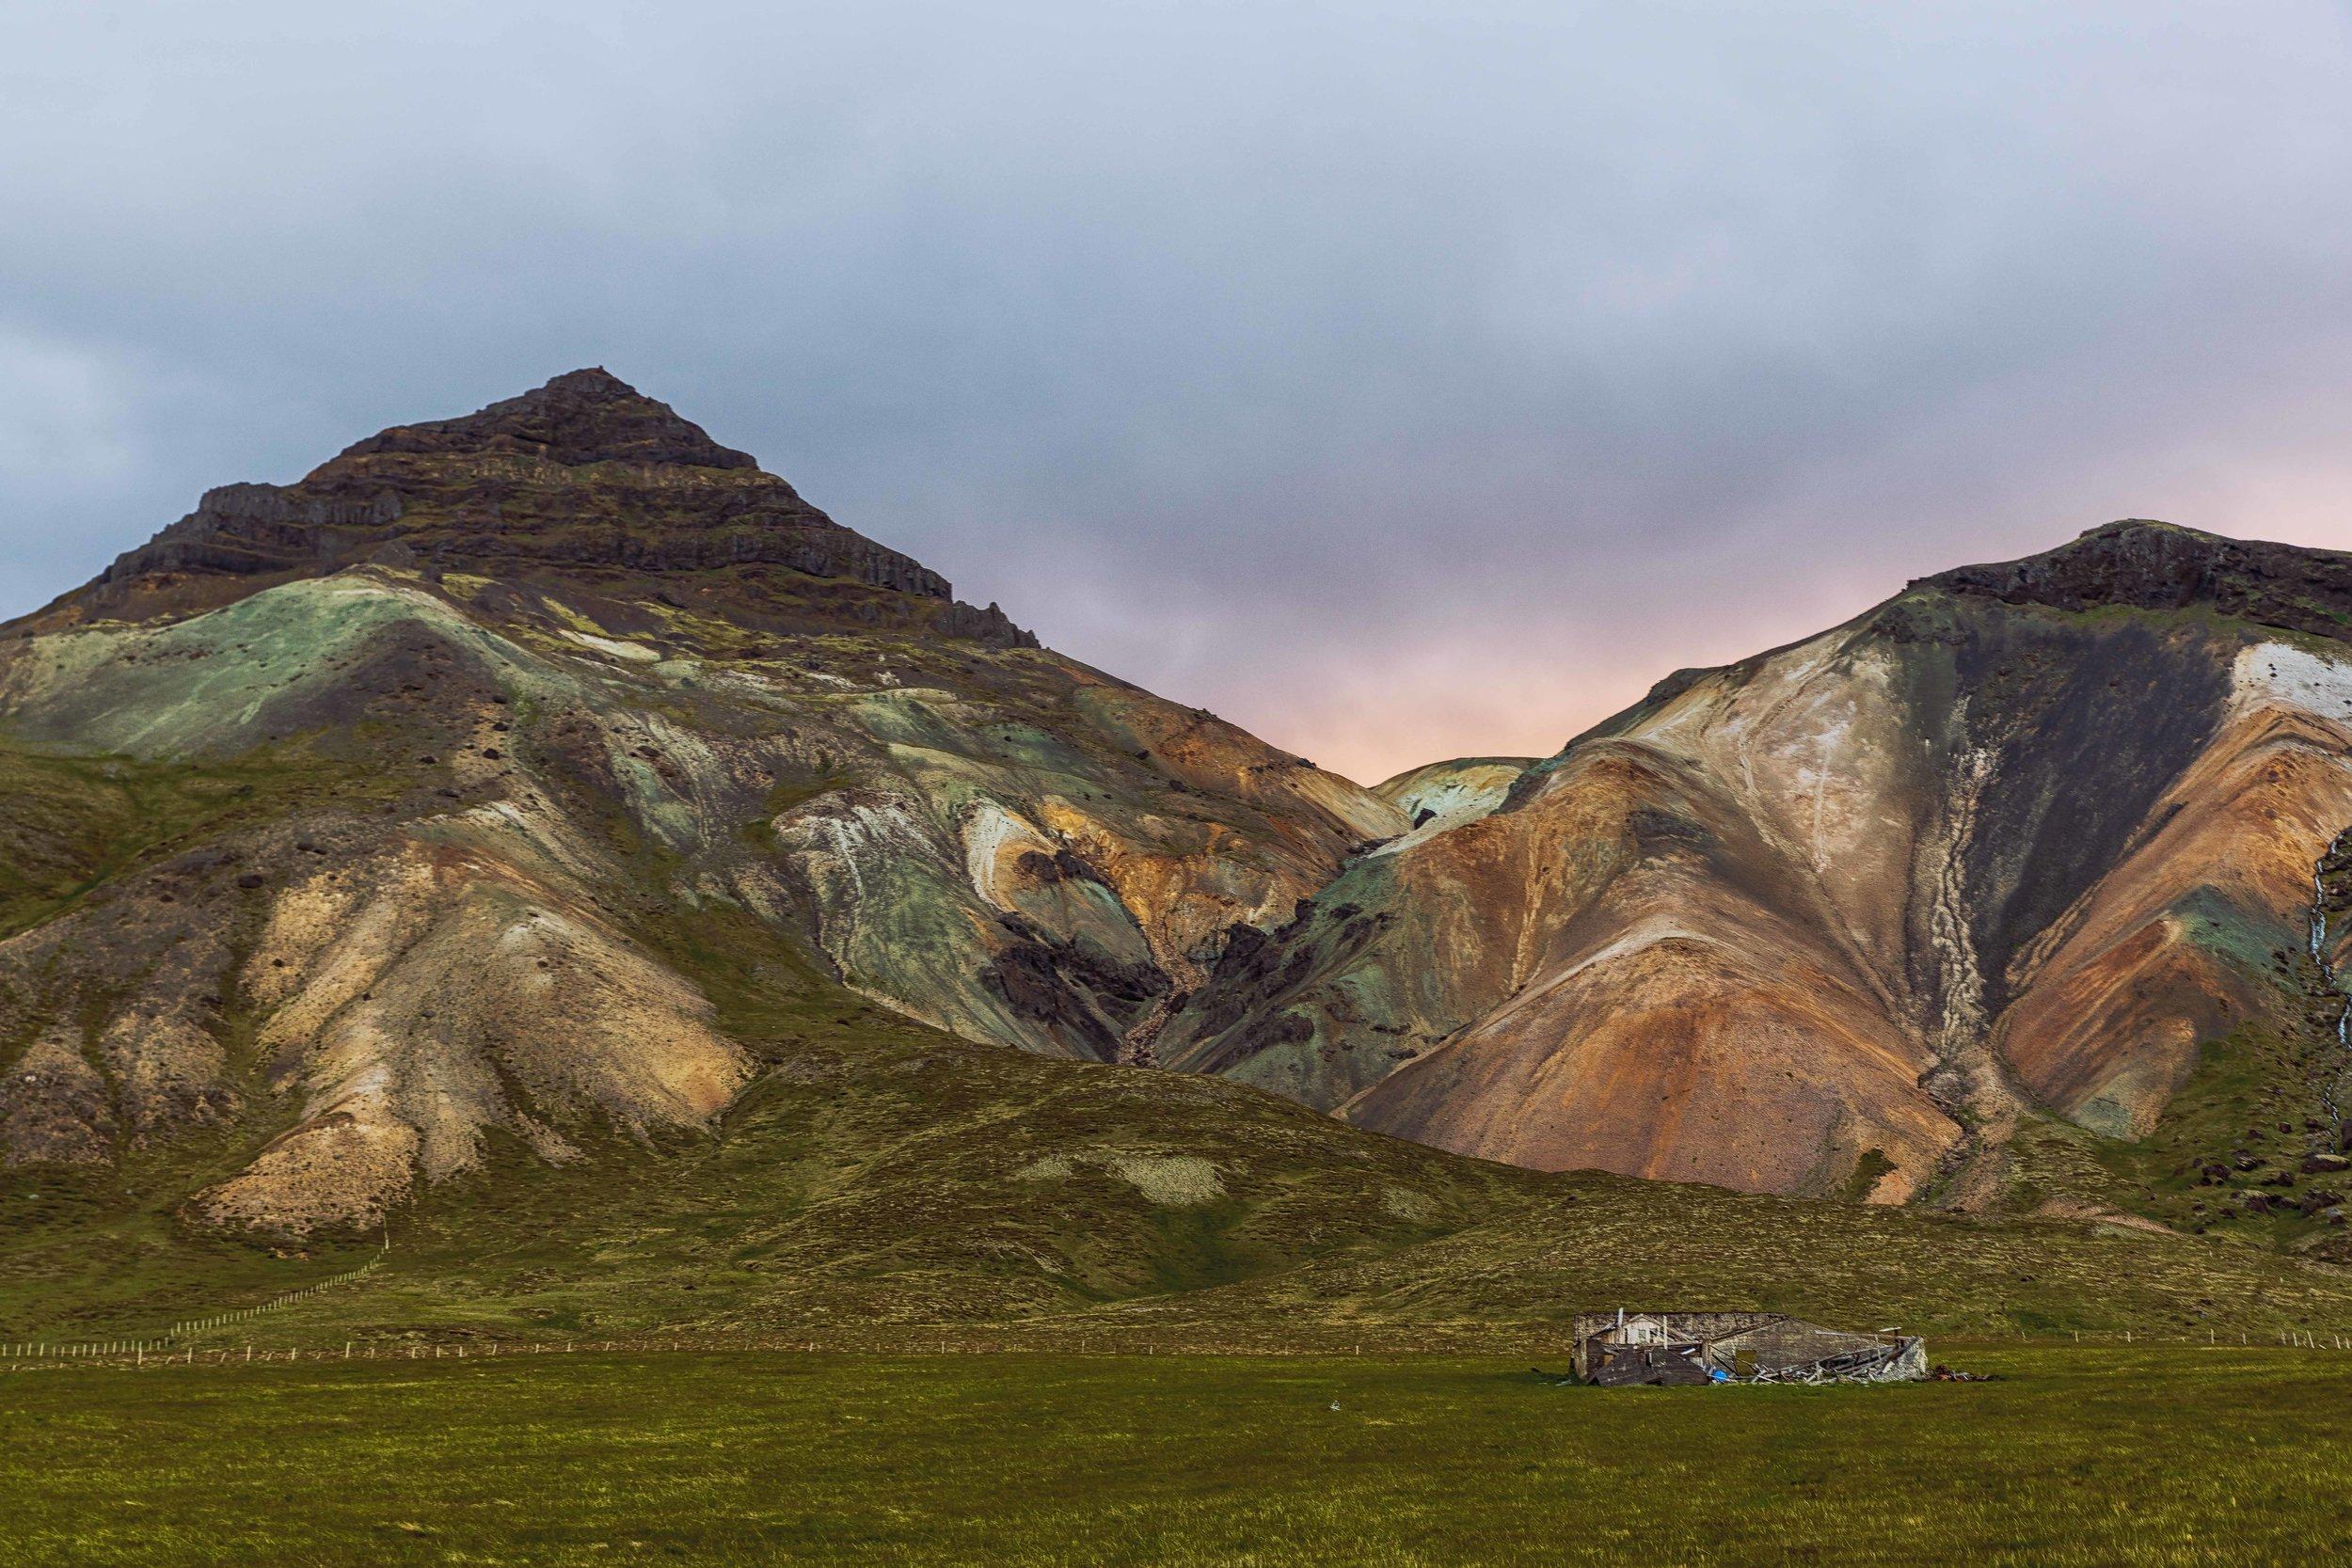 A colorful landscape scene along the Snaefellsnes Peninsula